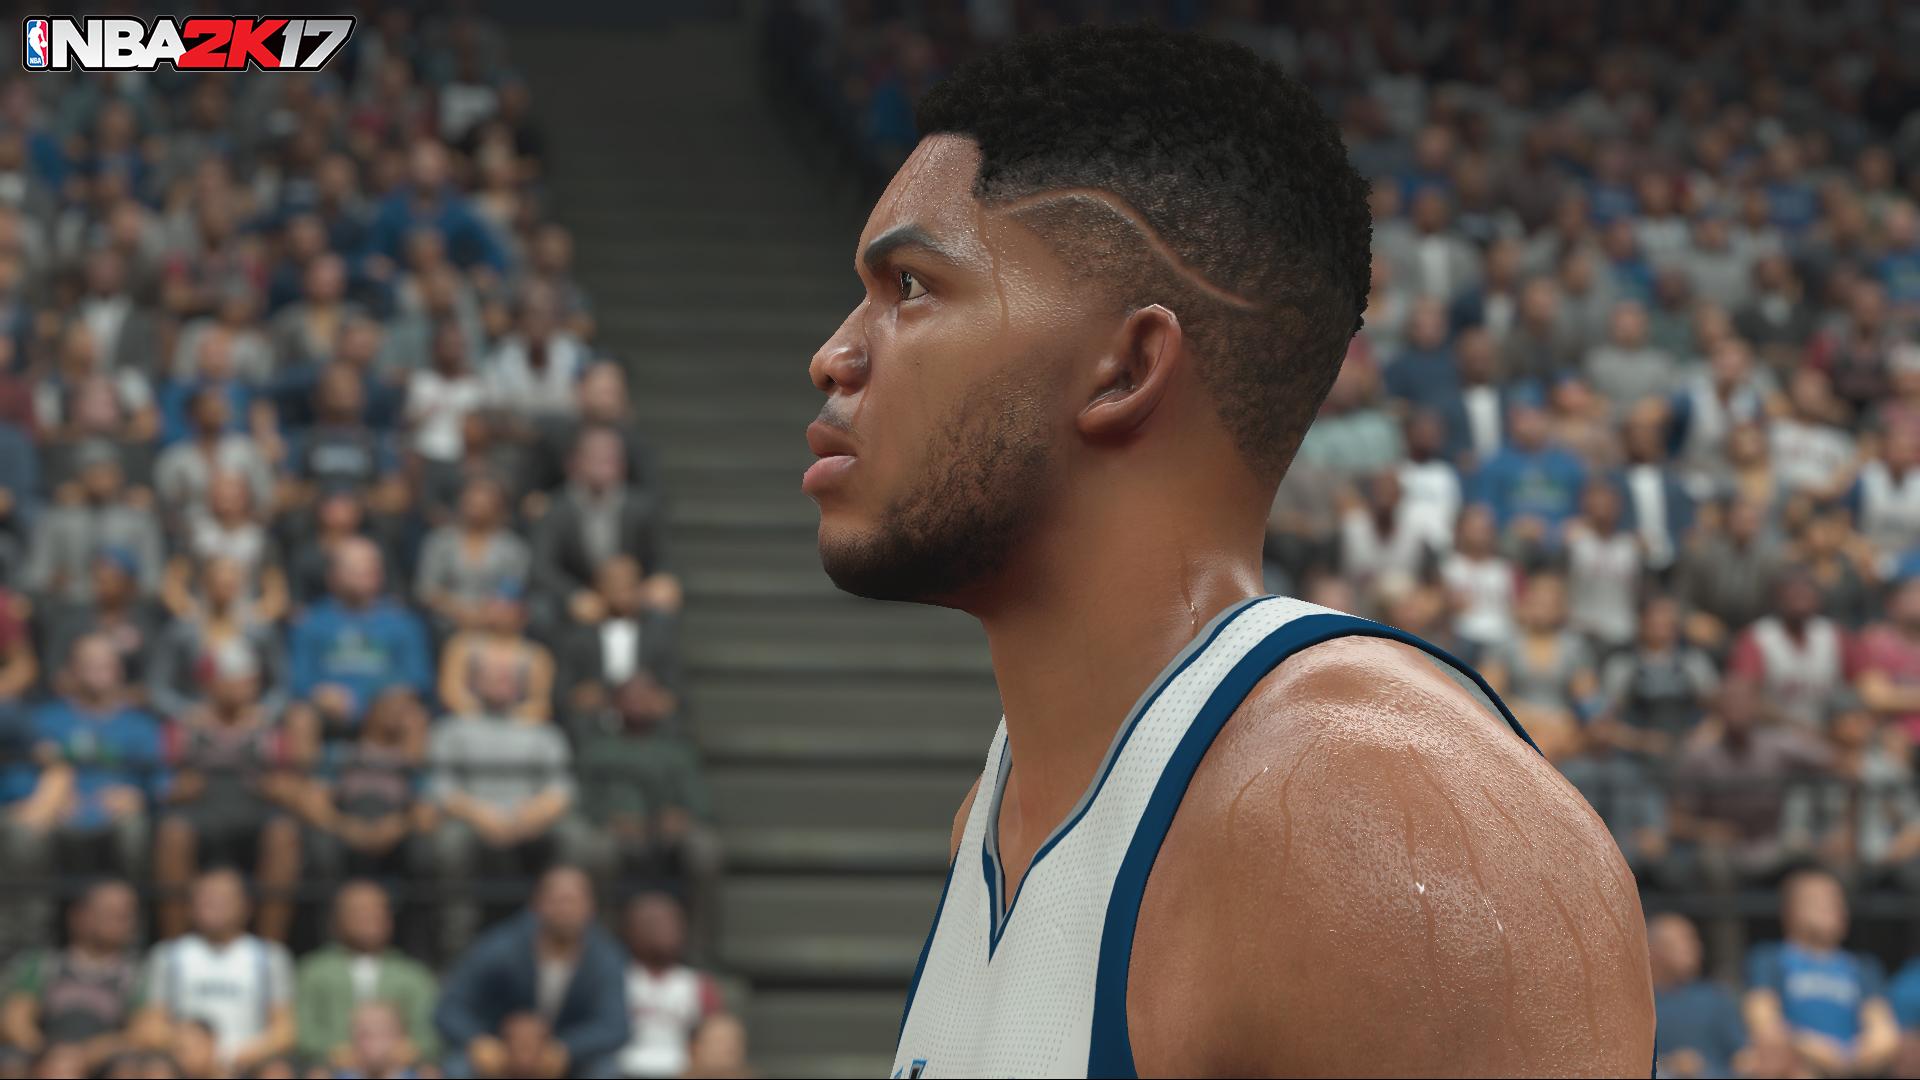 《NBA 2K17》NBA球迷的狂欢节9